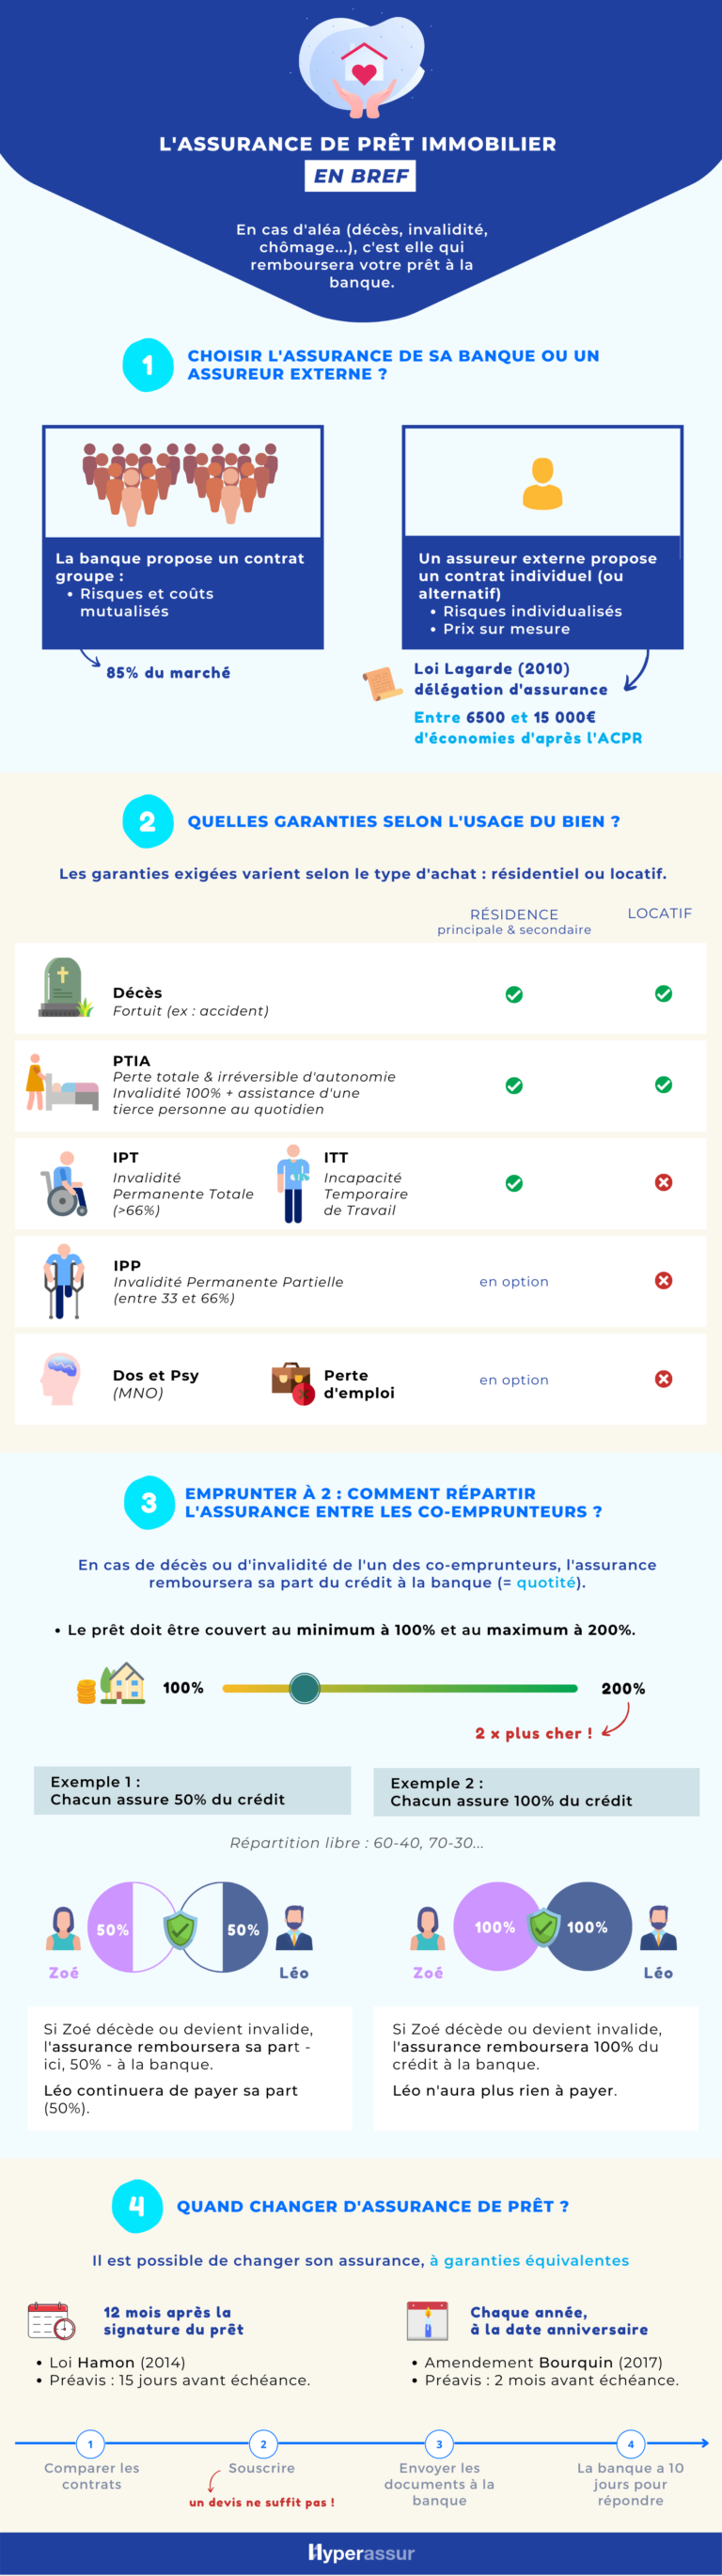 infographie-guide-assurance-de-pret-immobilier-2021-hyperassur-768x2741